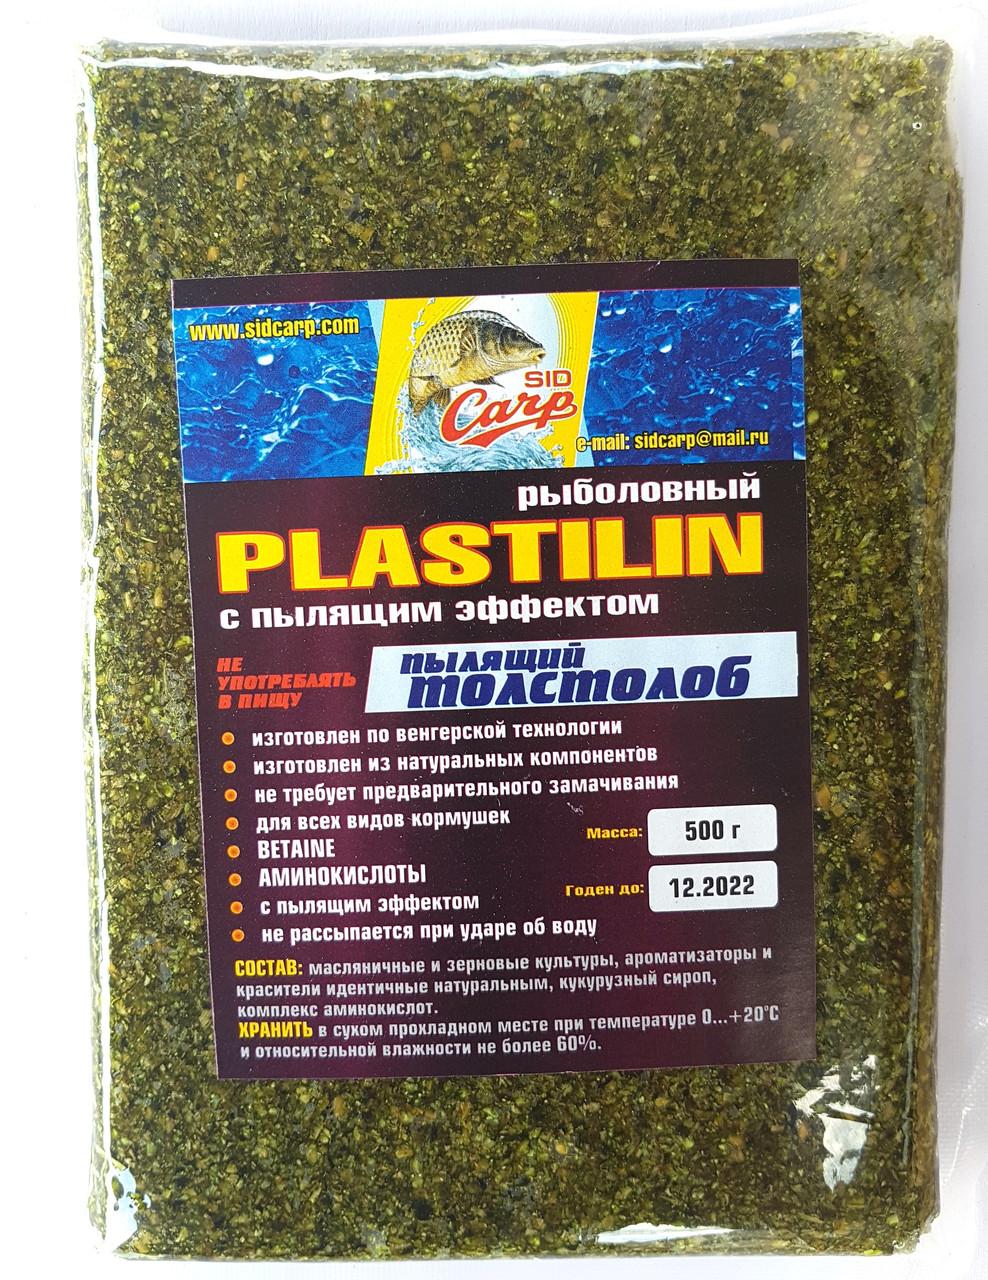 Пластилин для рыбалки Sid Carp, пылящий, Толстолоб, 500гр